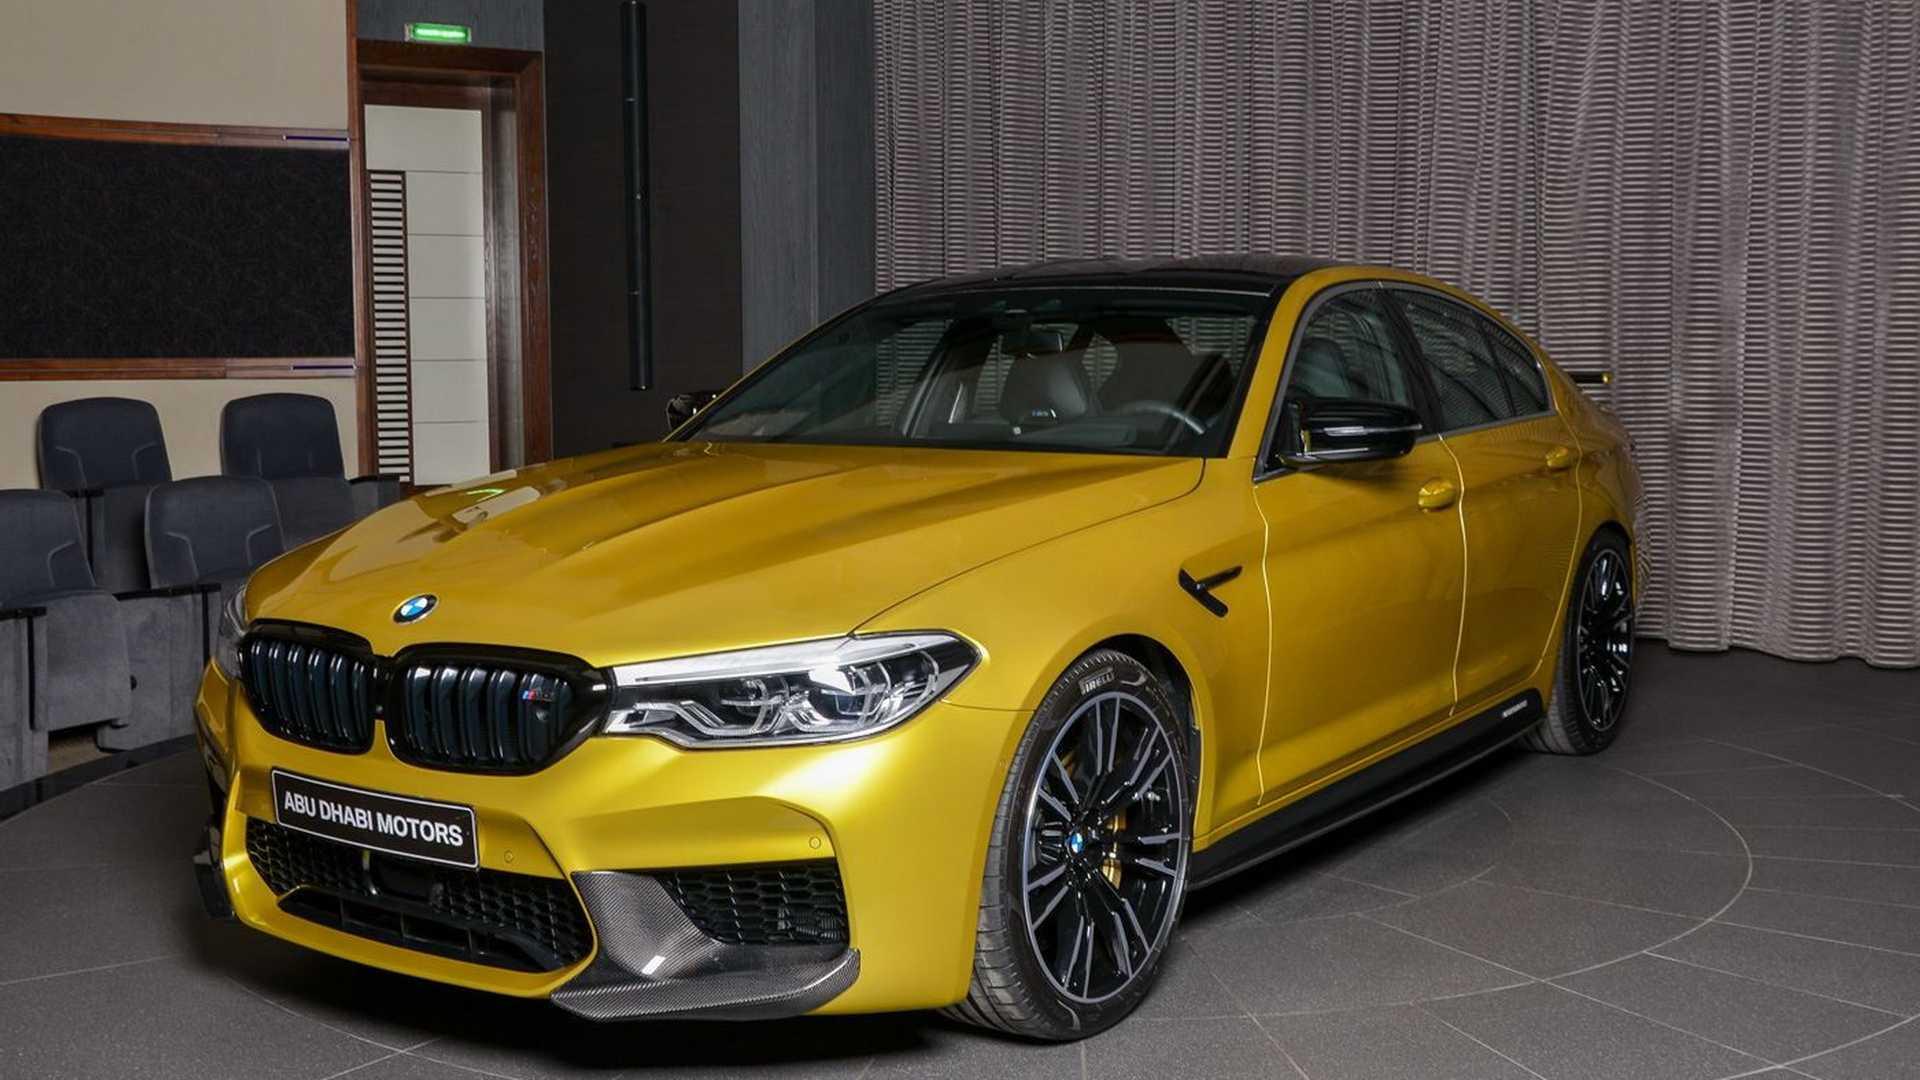 bmw-m5-competit2ion-austin-yellow